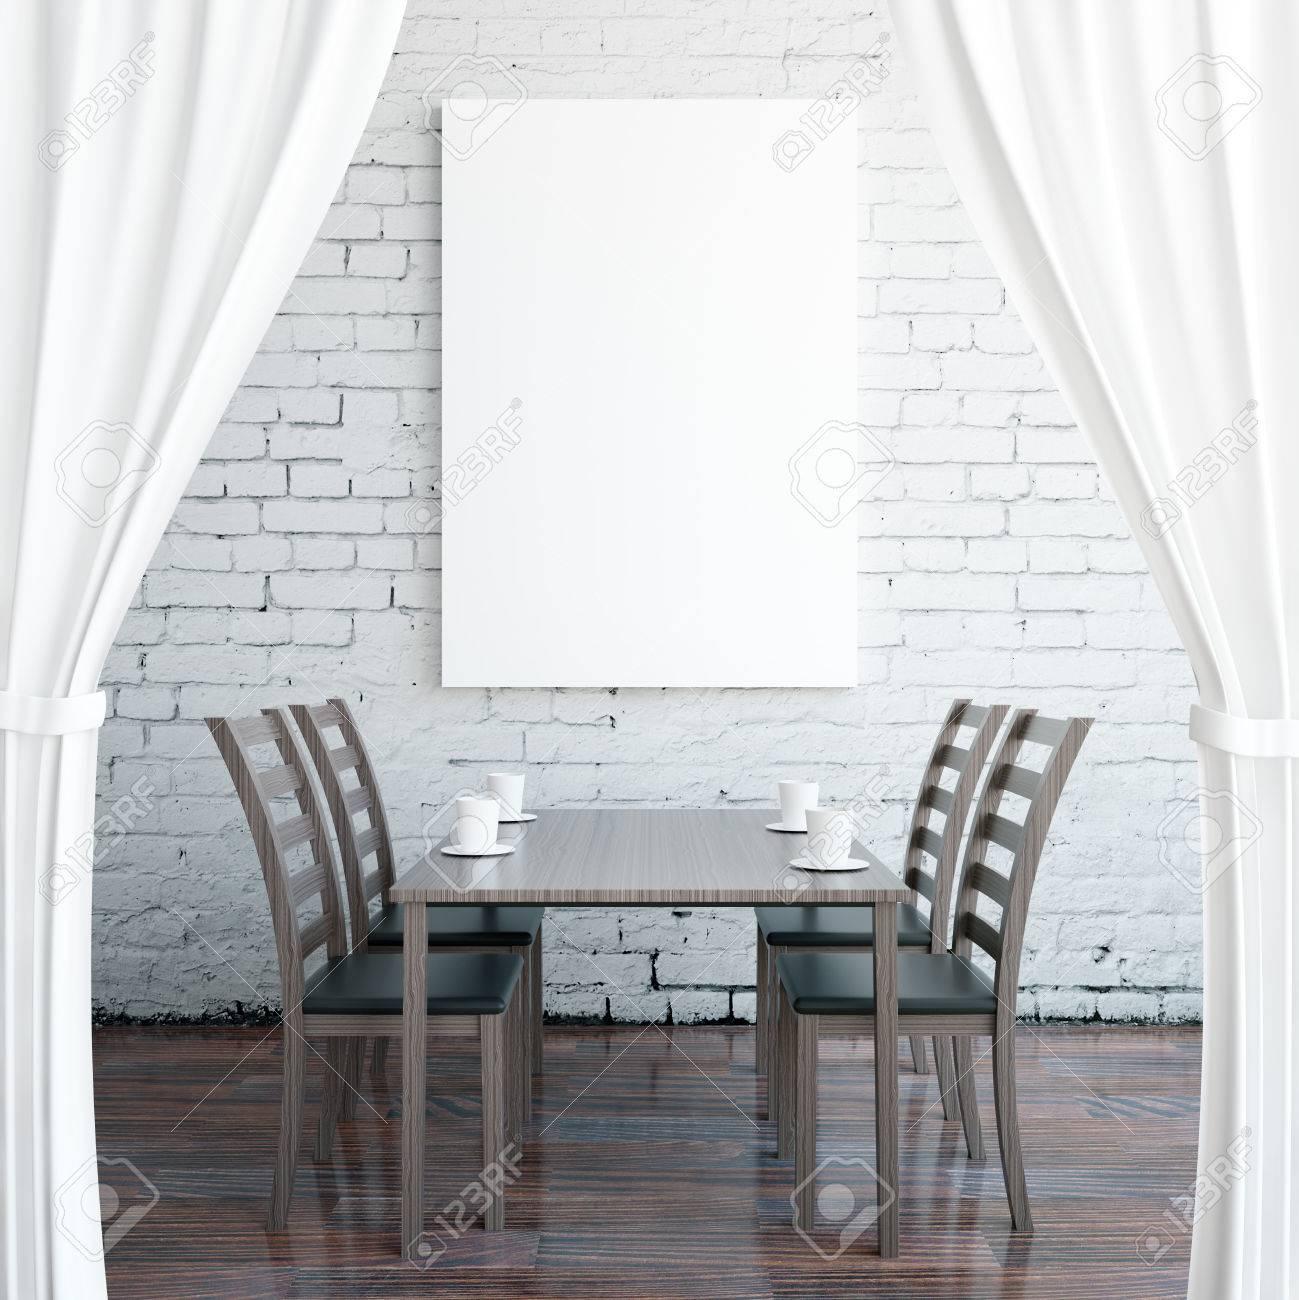 Creative Cafe Interior With Dark Wooden Floor Empty Poster On